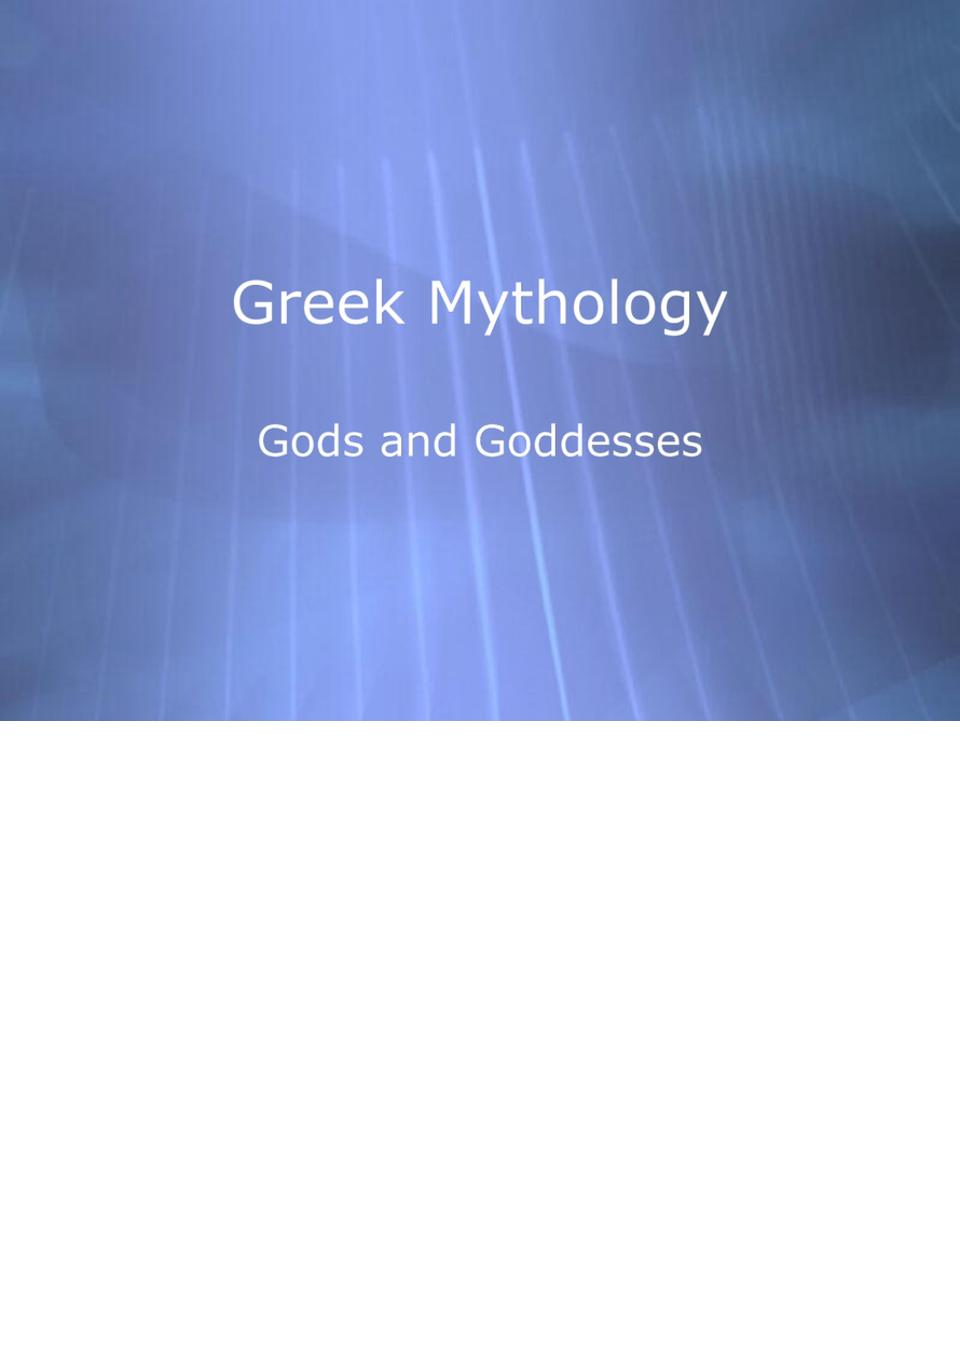 mythology(12pictures).ppt